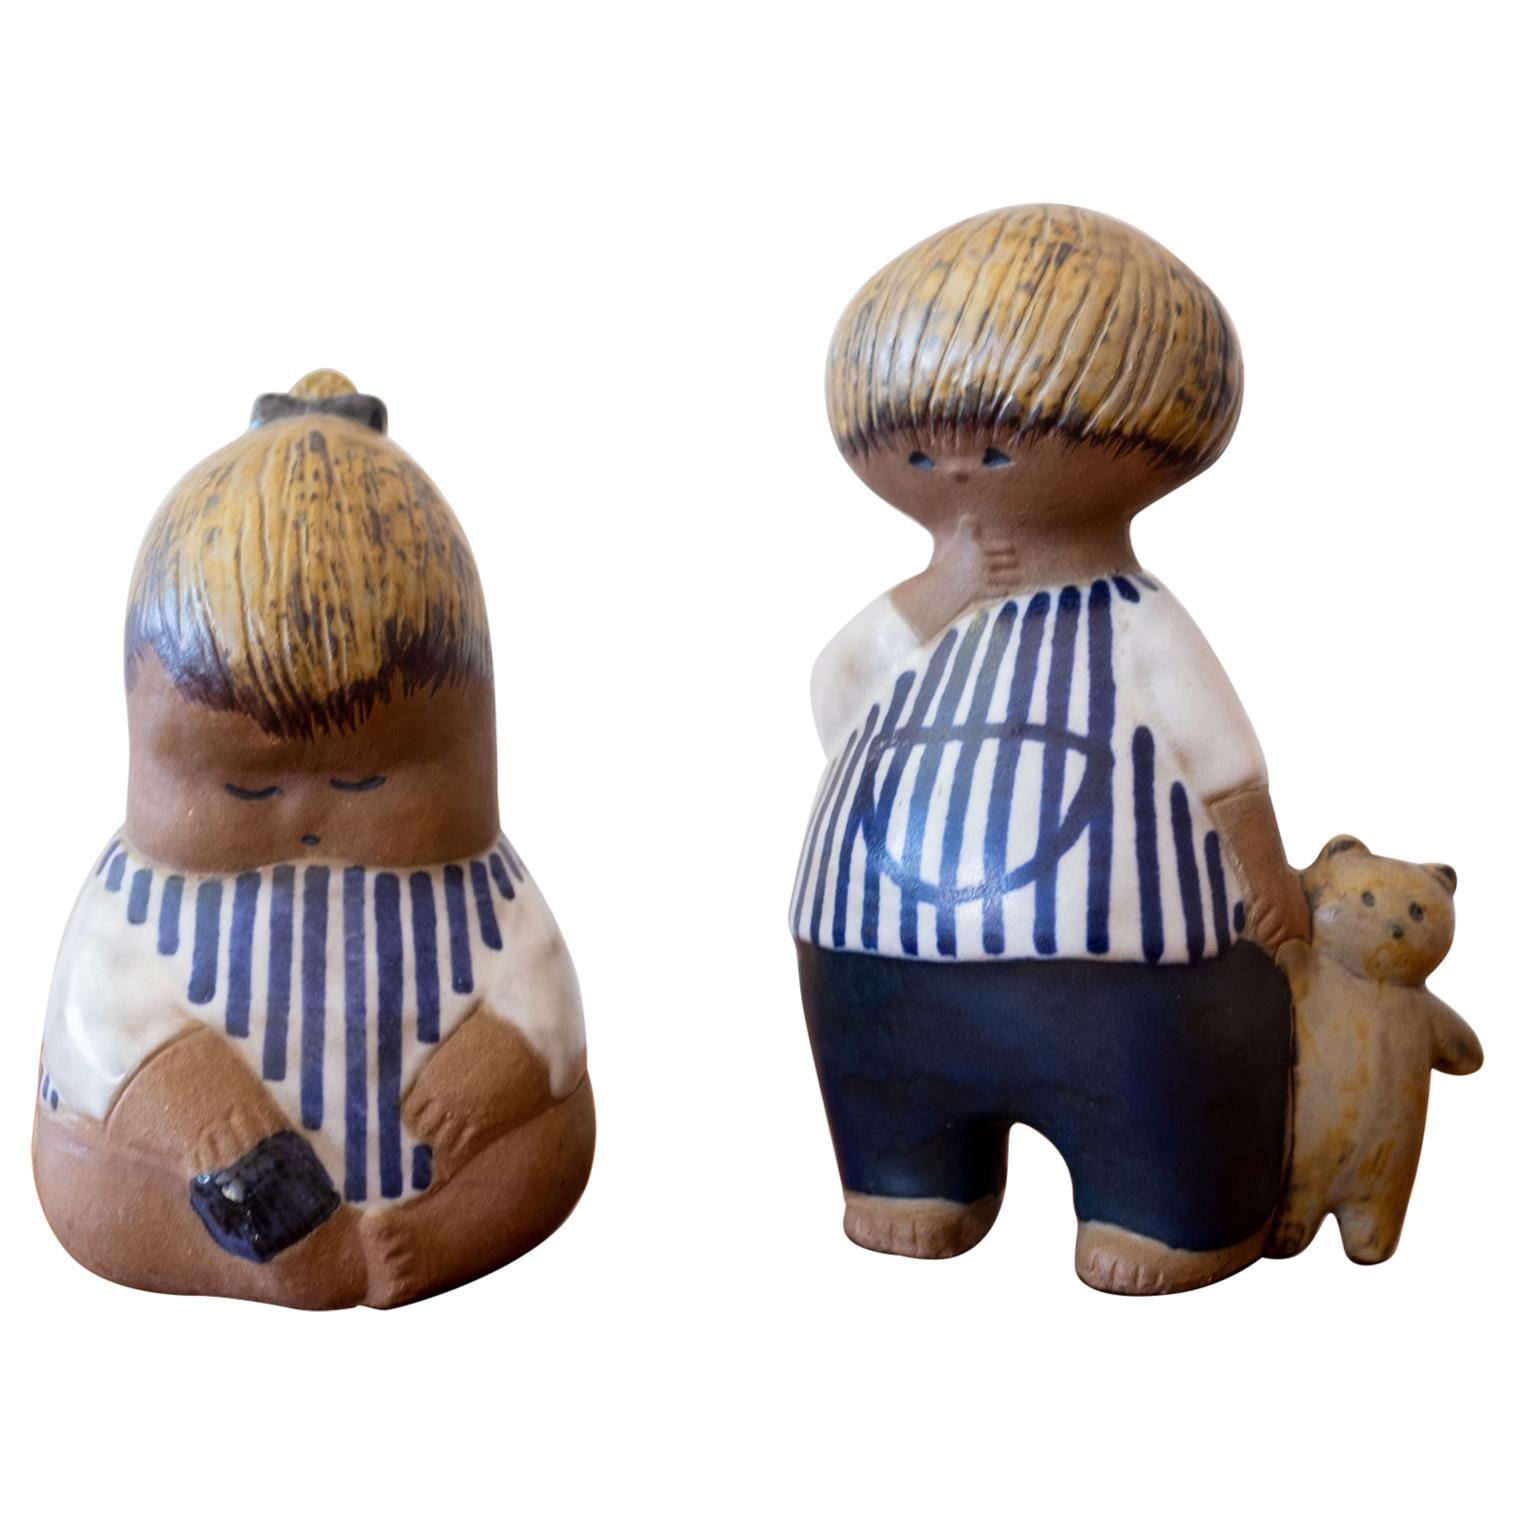 Lisa Larson Ceramic Figures